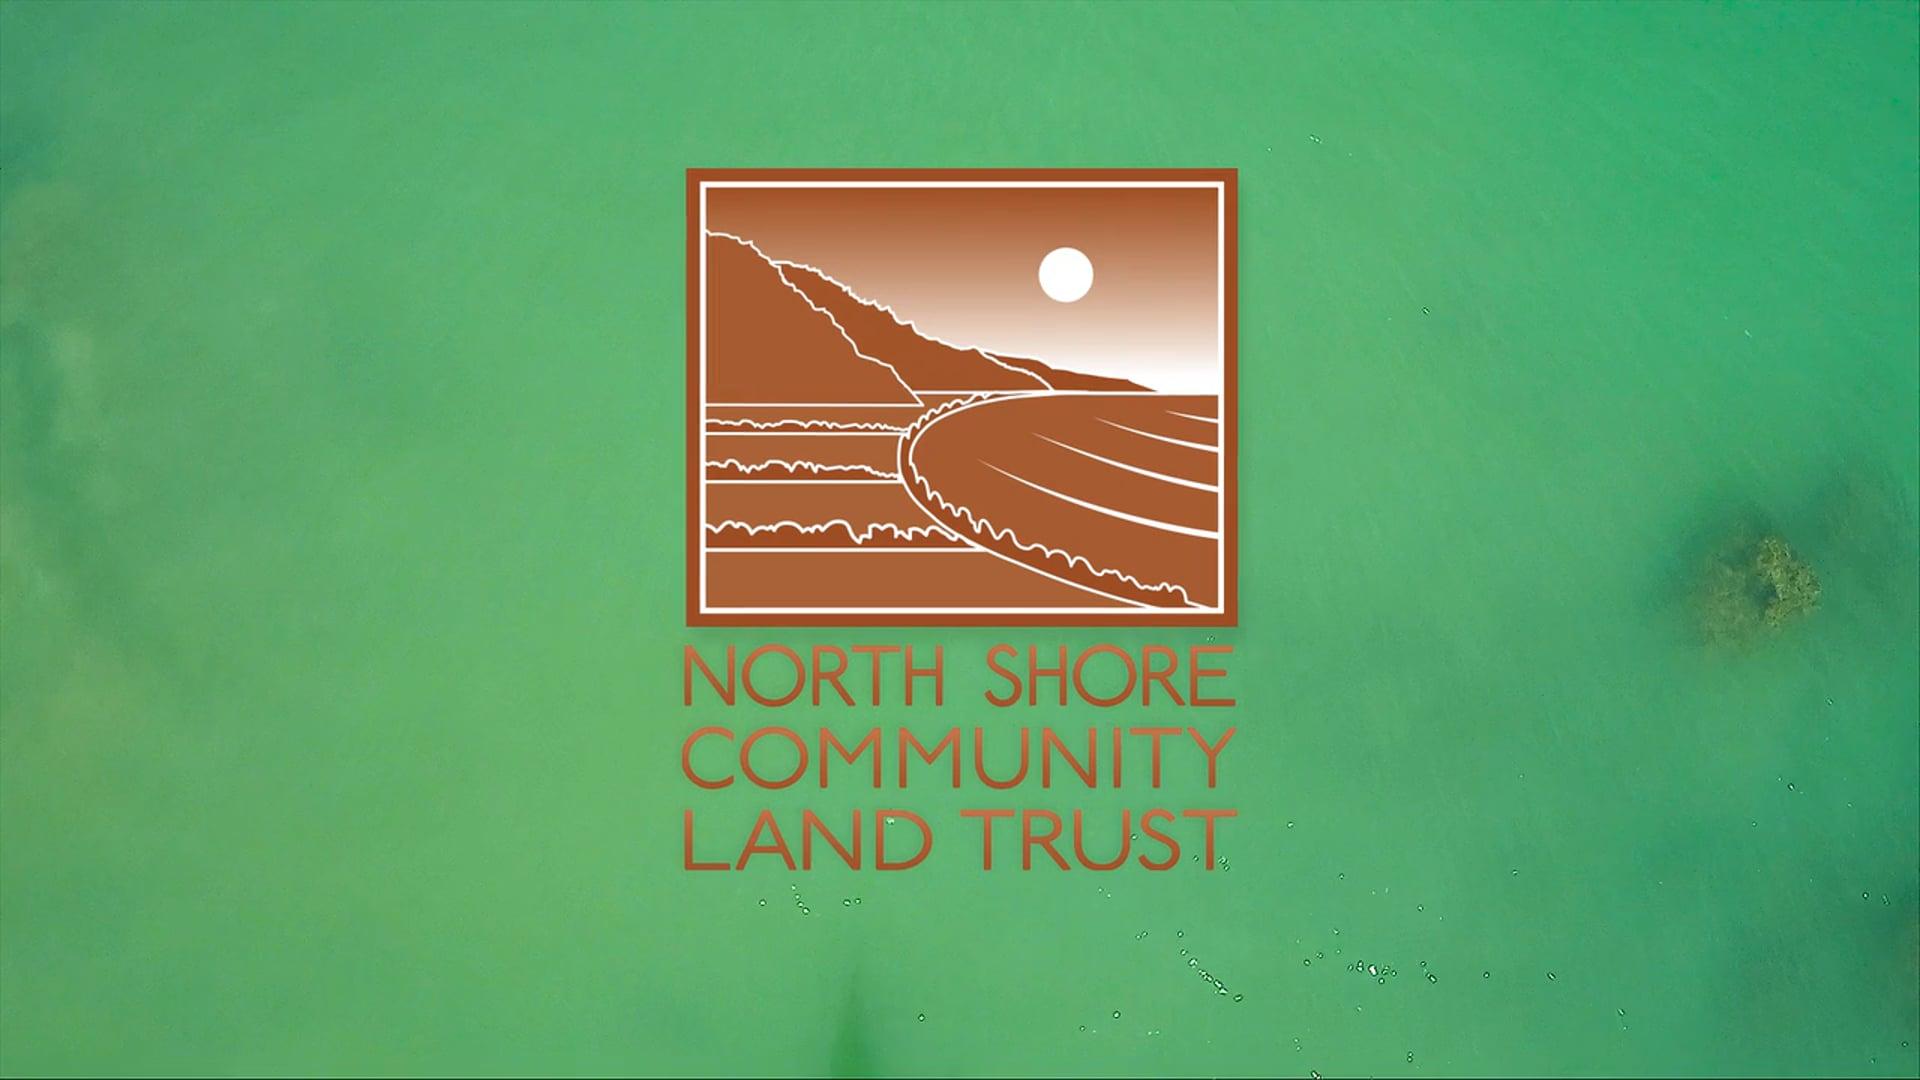 North Shore Community Land Trust